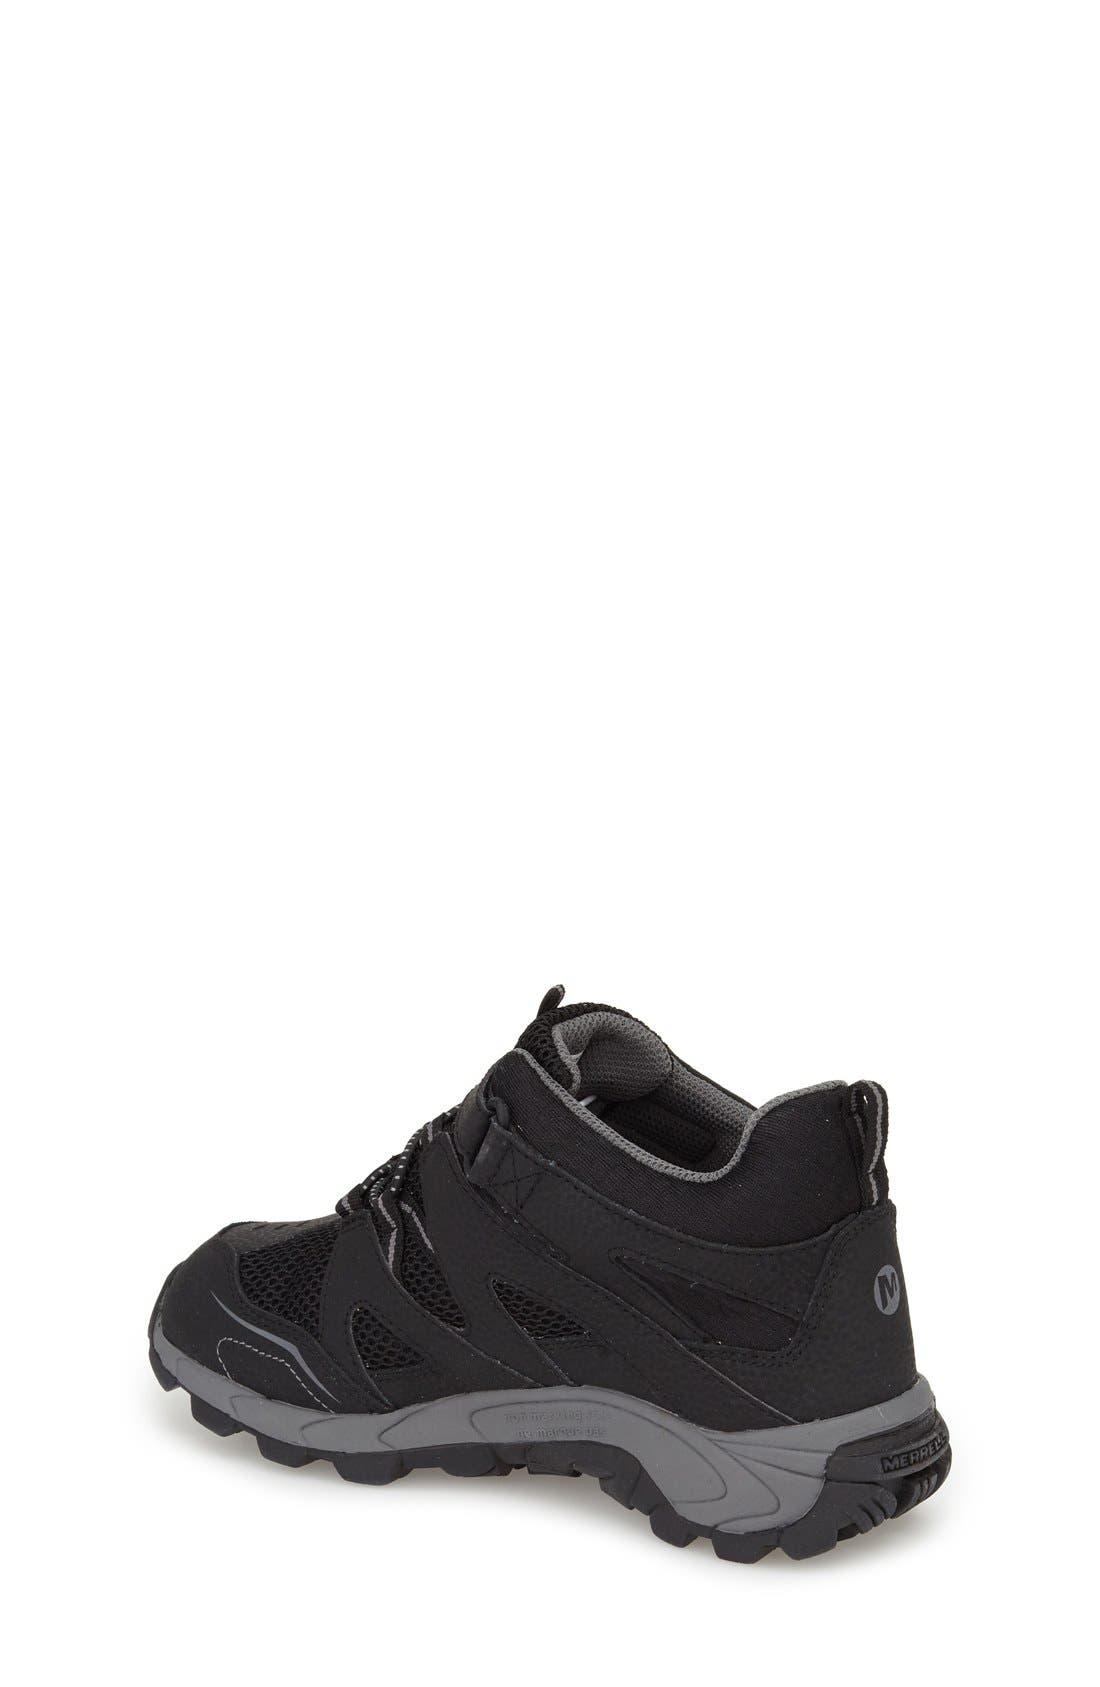 'Hilltop' Waterproof Sneaker,                             Alternate thumbnail 2, color,                             001